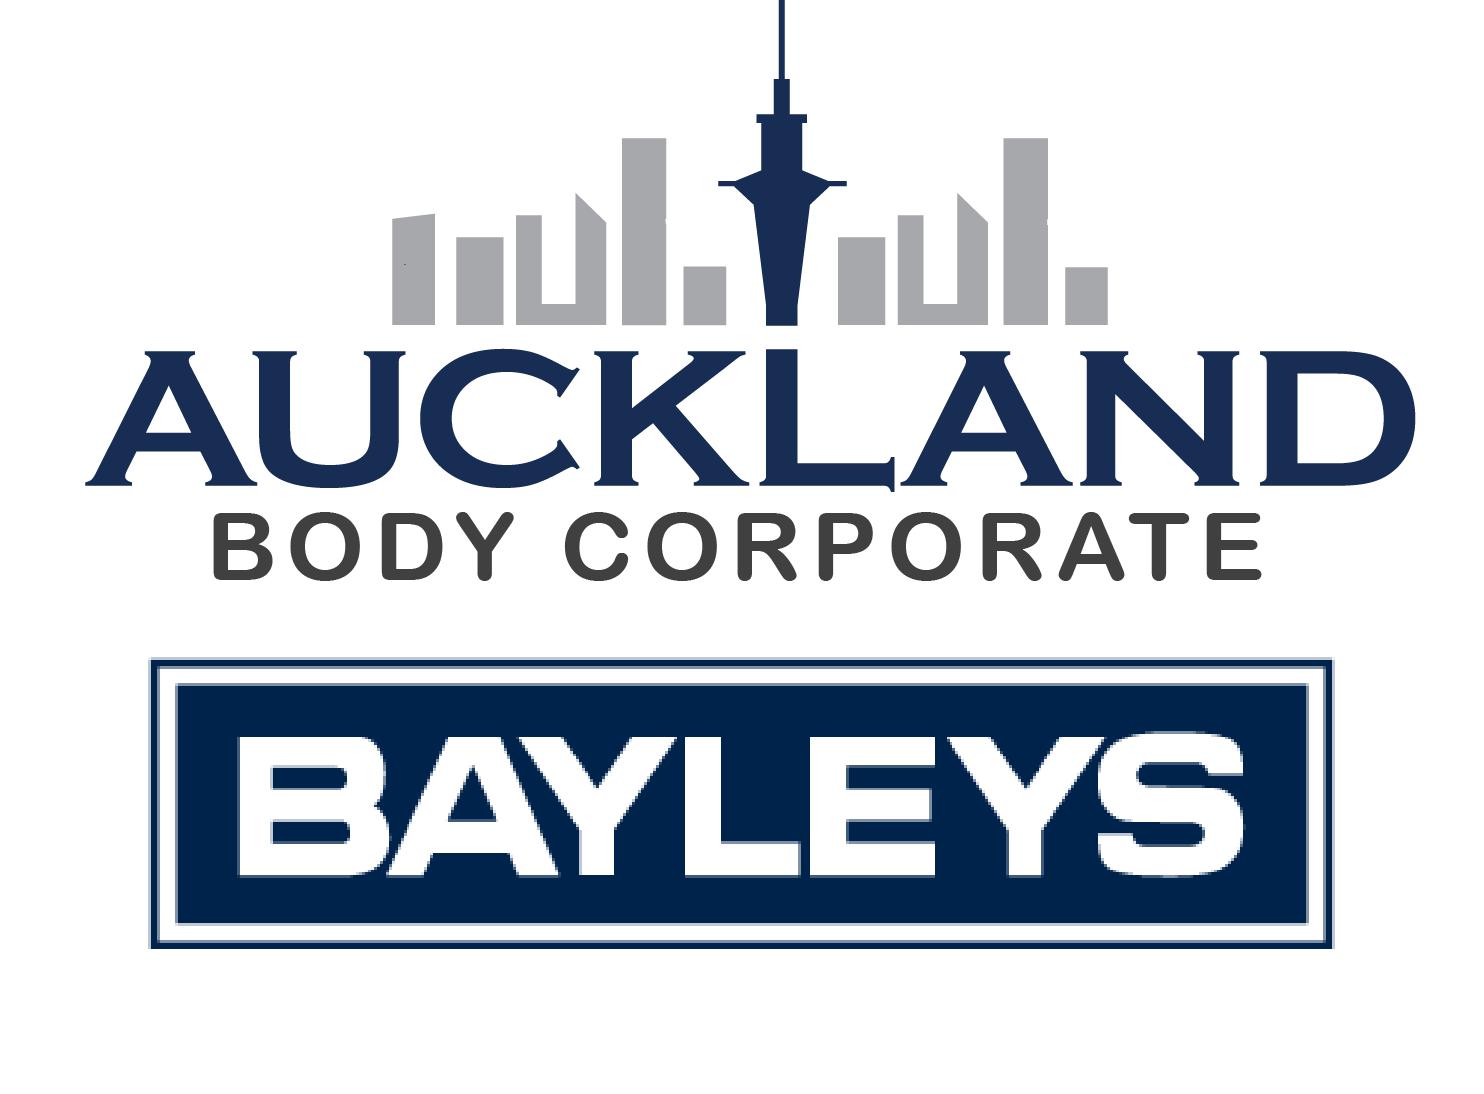 Auckland Body Corporate Bayleys White BG